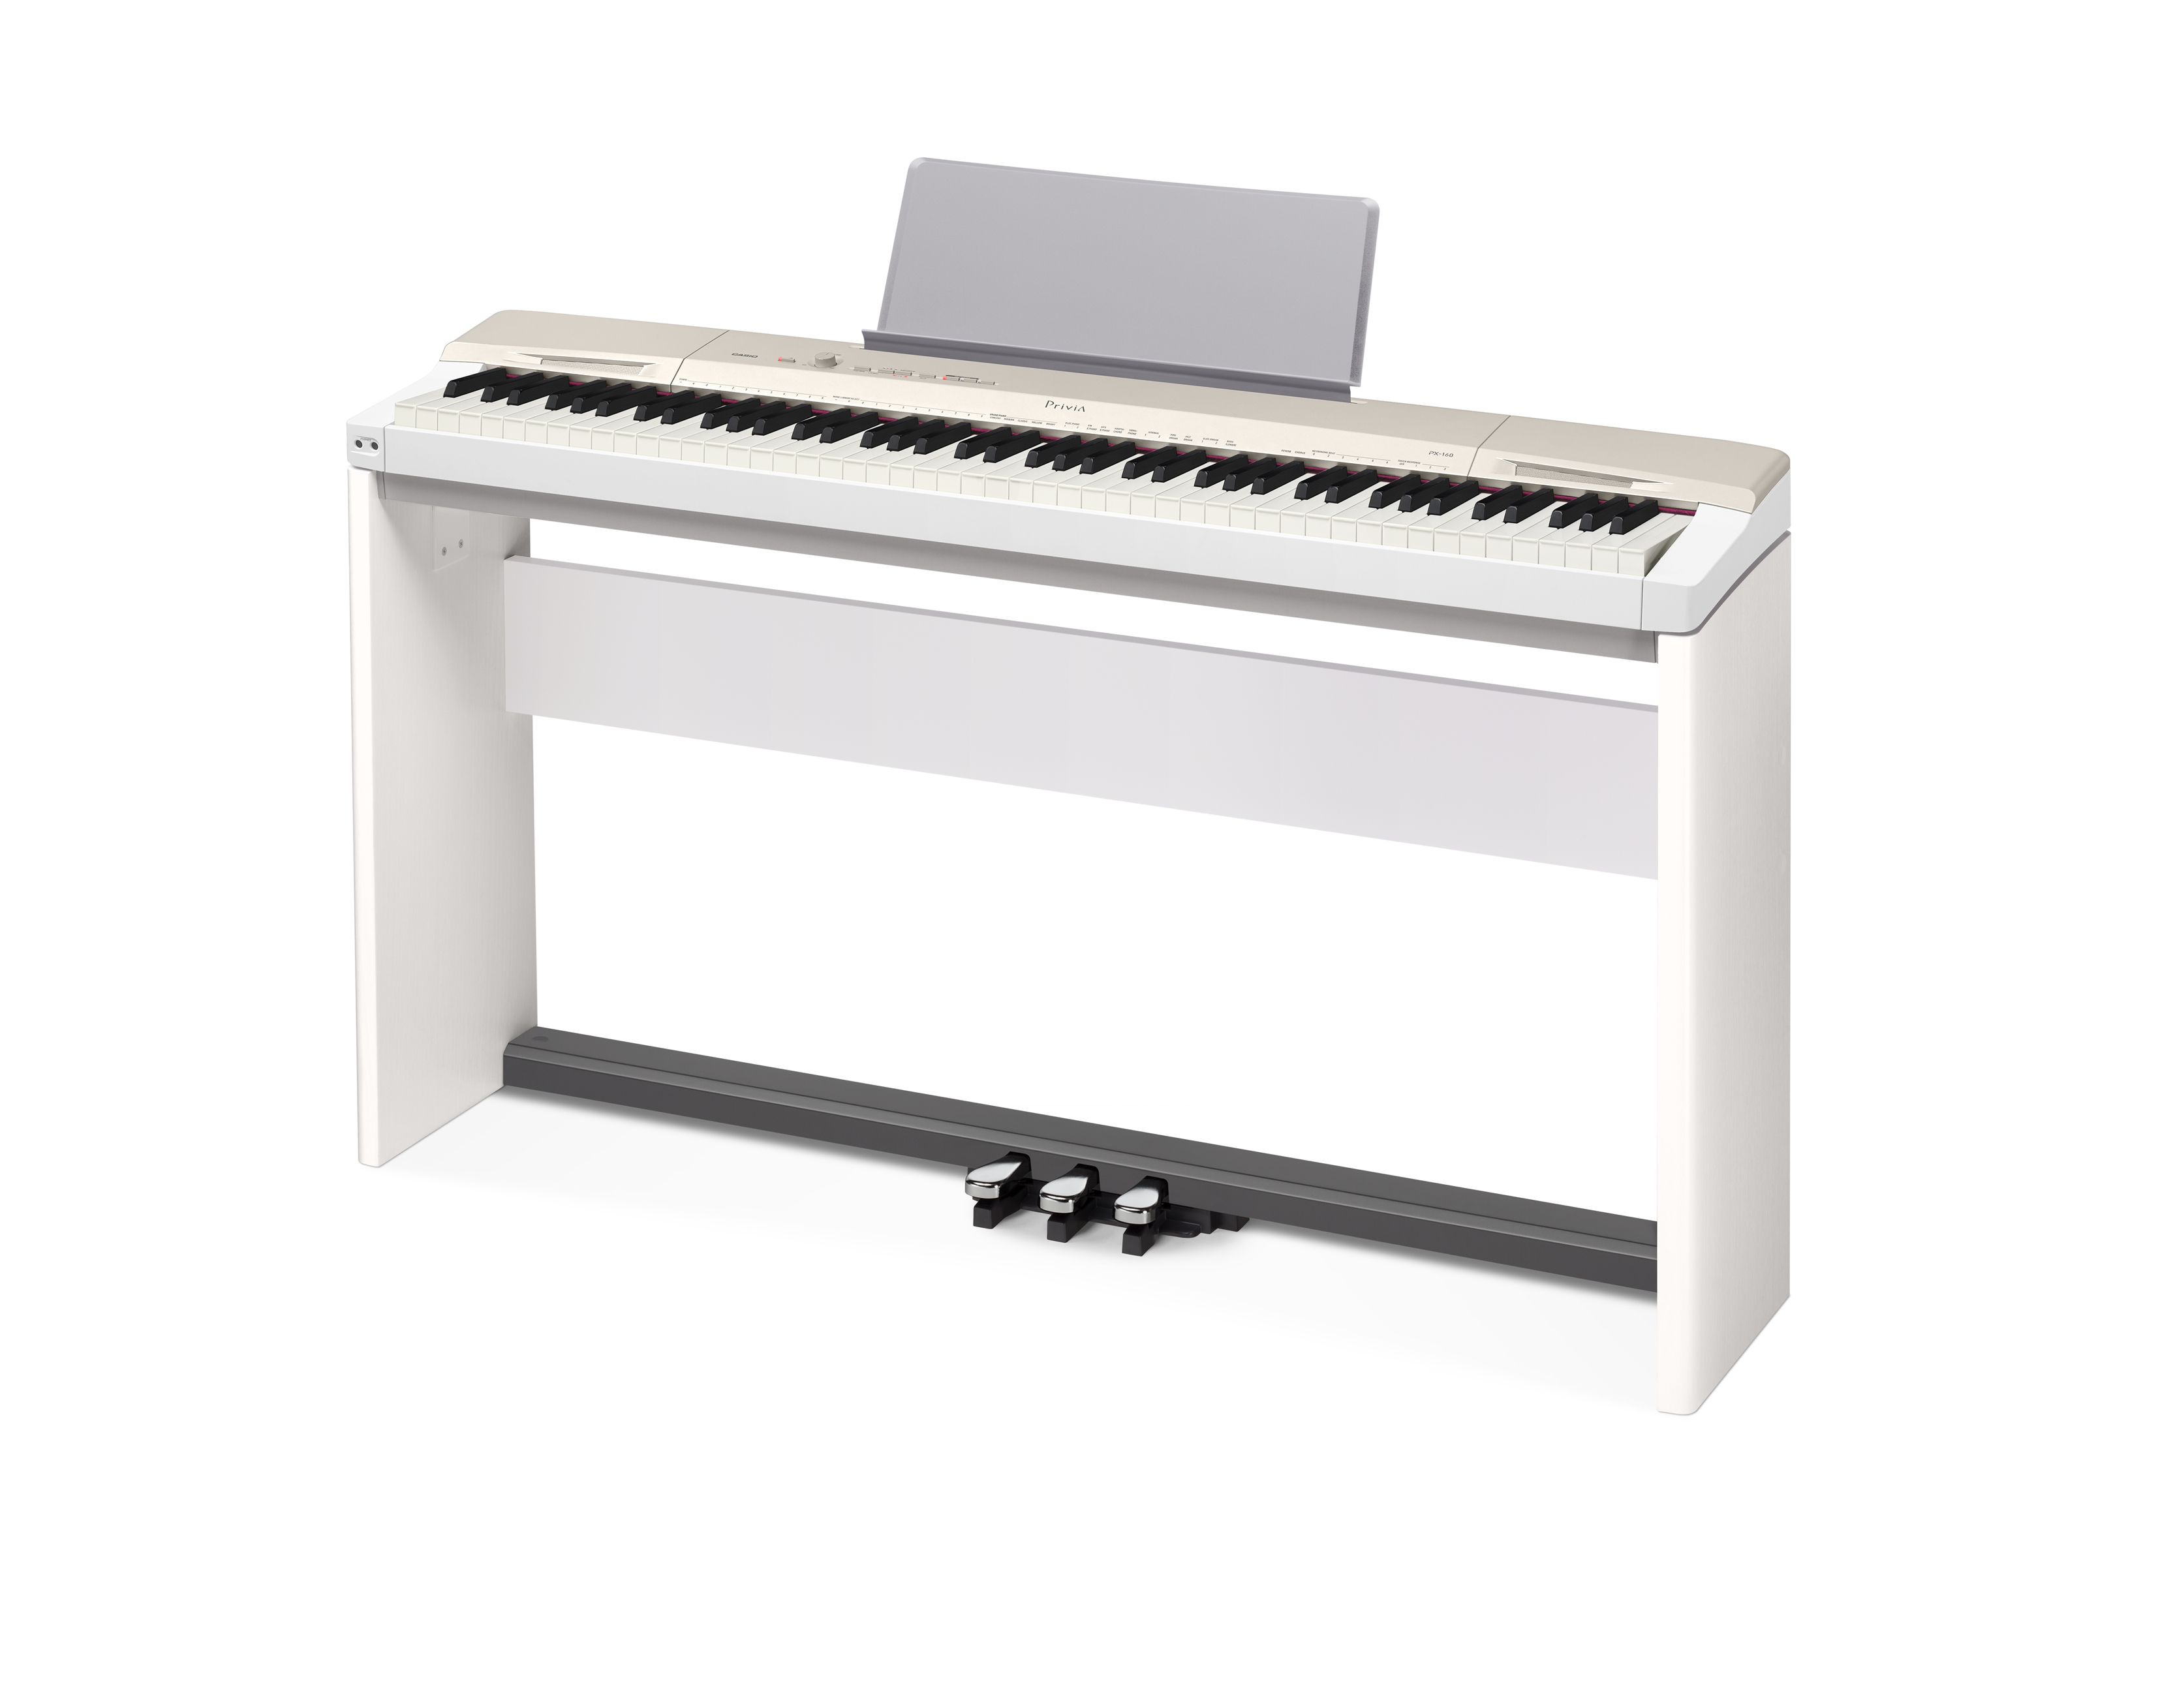 casio privia px 160 digital piano champagne gold w cs 67 stand sp 33 pedal ebay. Black Bedroom Furniture Sets. Home Design Ideas